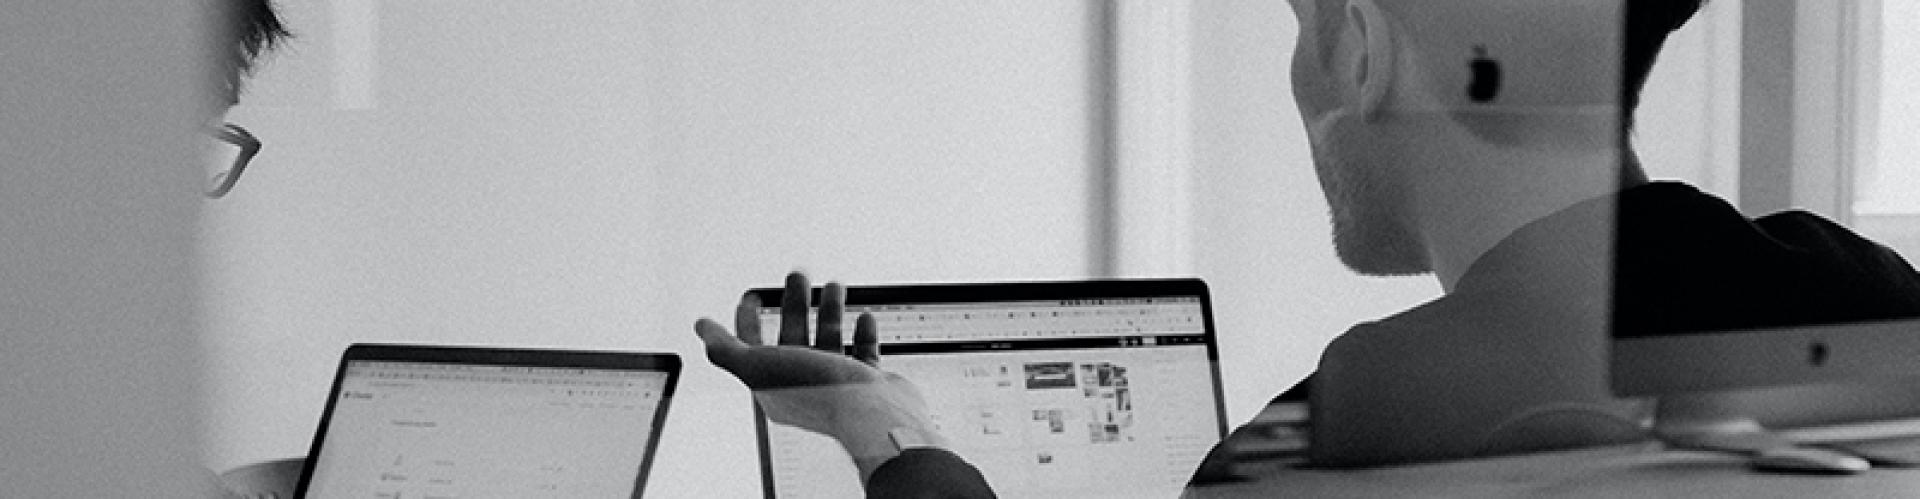 OD Online marketing blogs, campagne blogs, branding blog